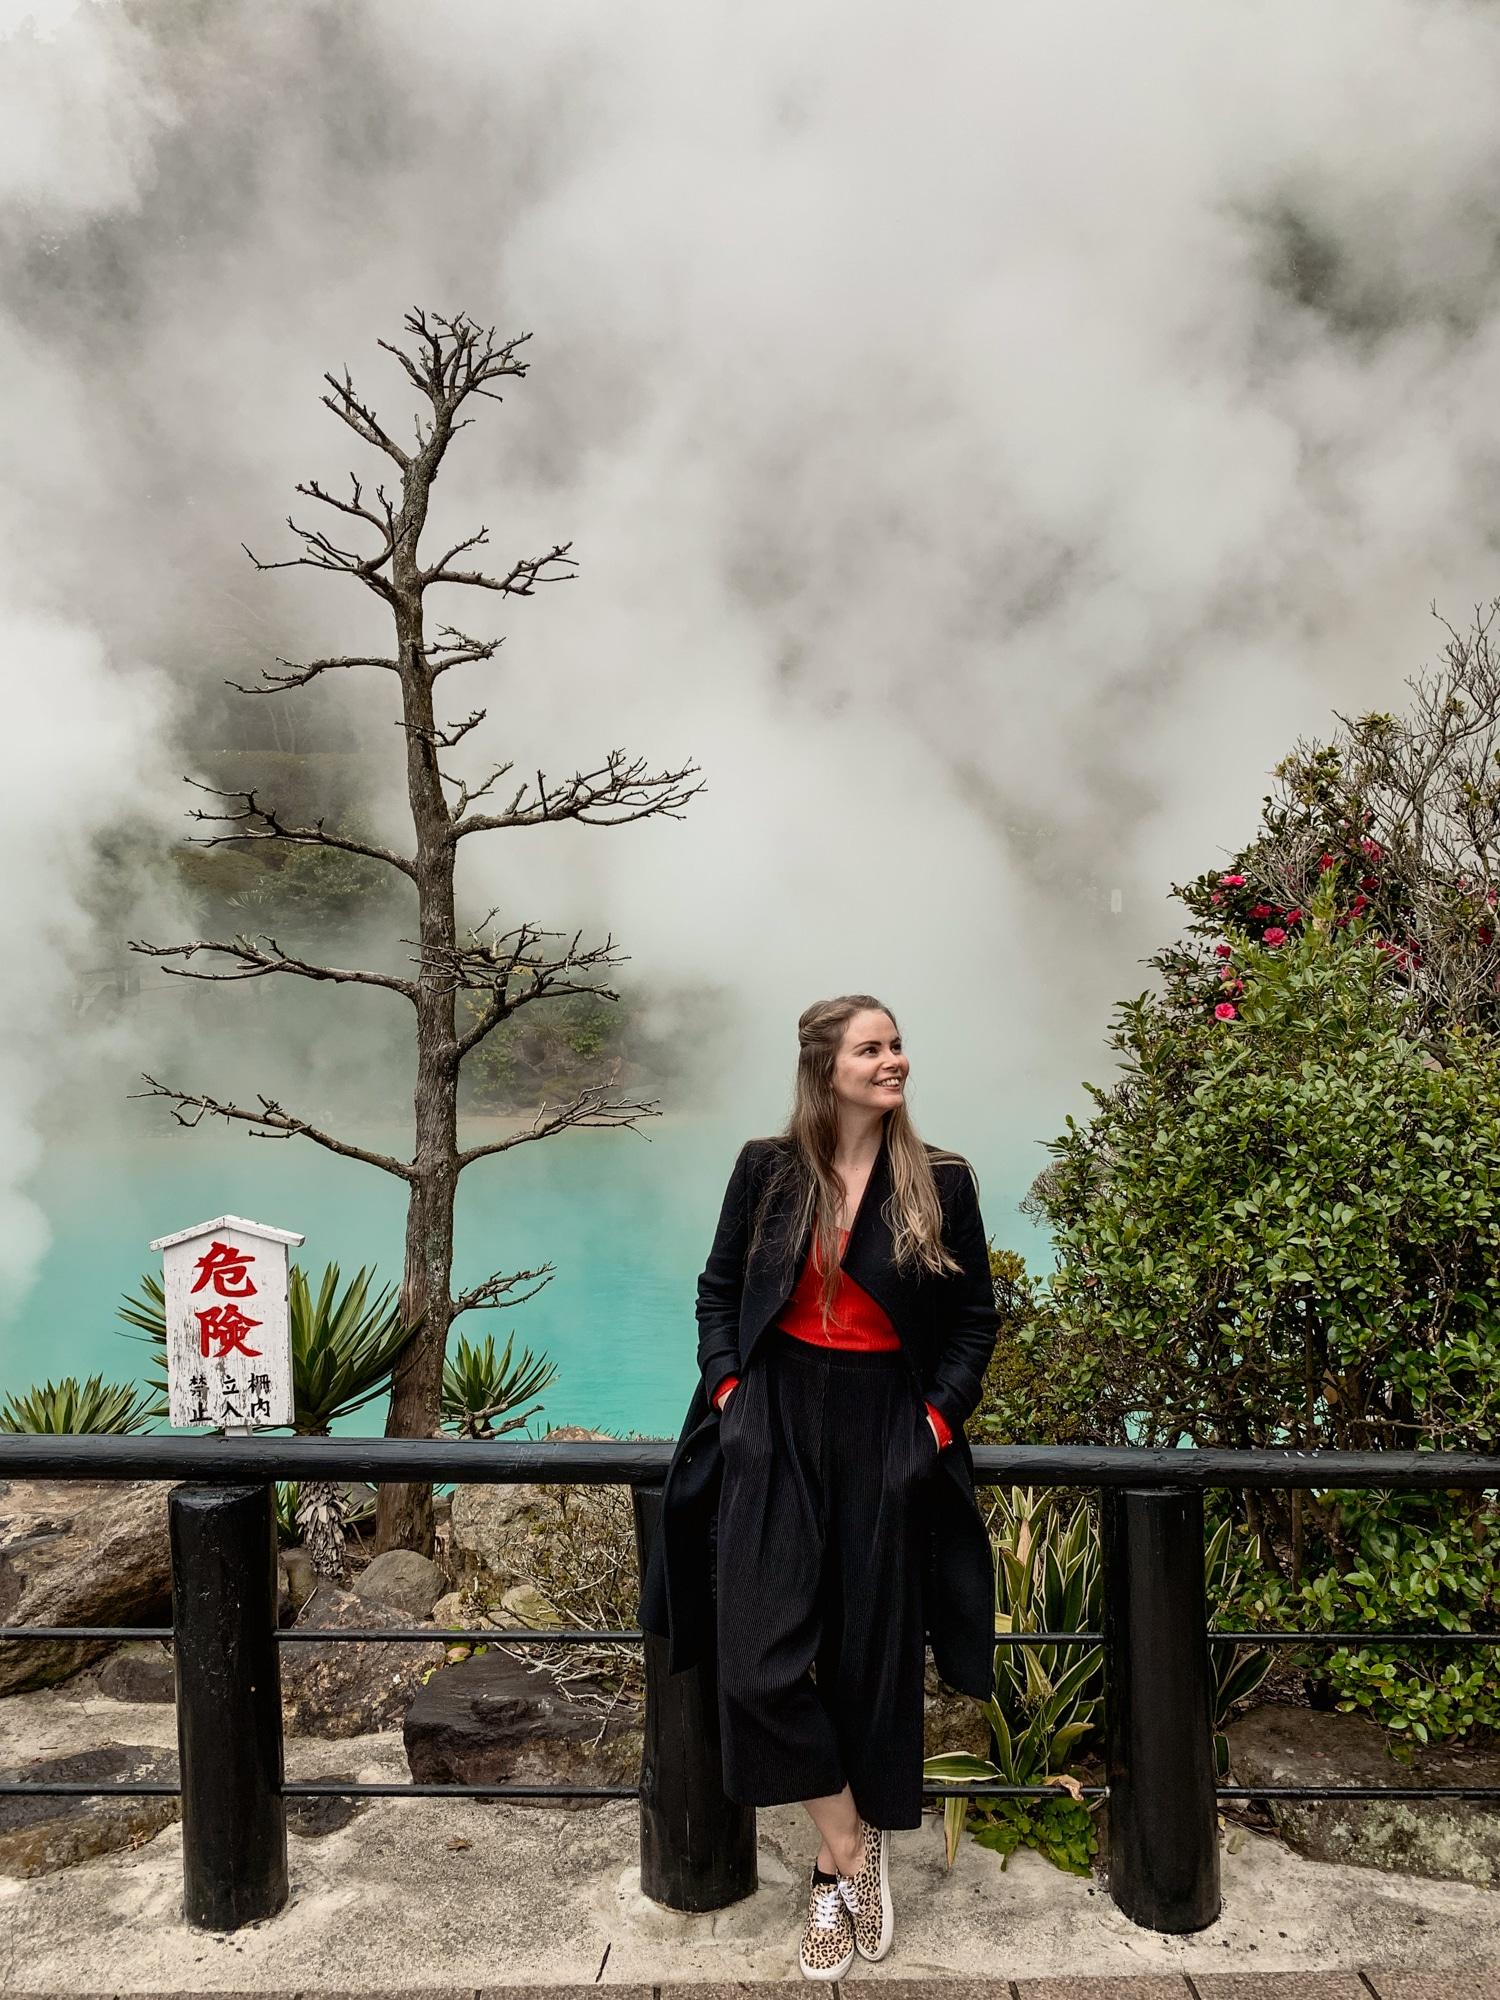 Kyushu Rundreise: Reisetipps, Onsen und Highlights in Japans Süden - Kurokawa Onsen Hopping - Beppu Seehölle Umi Jigoku